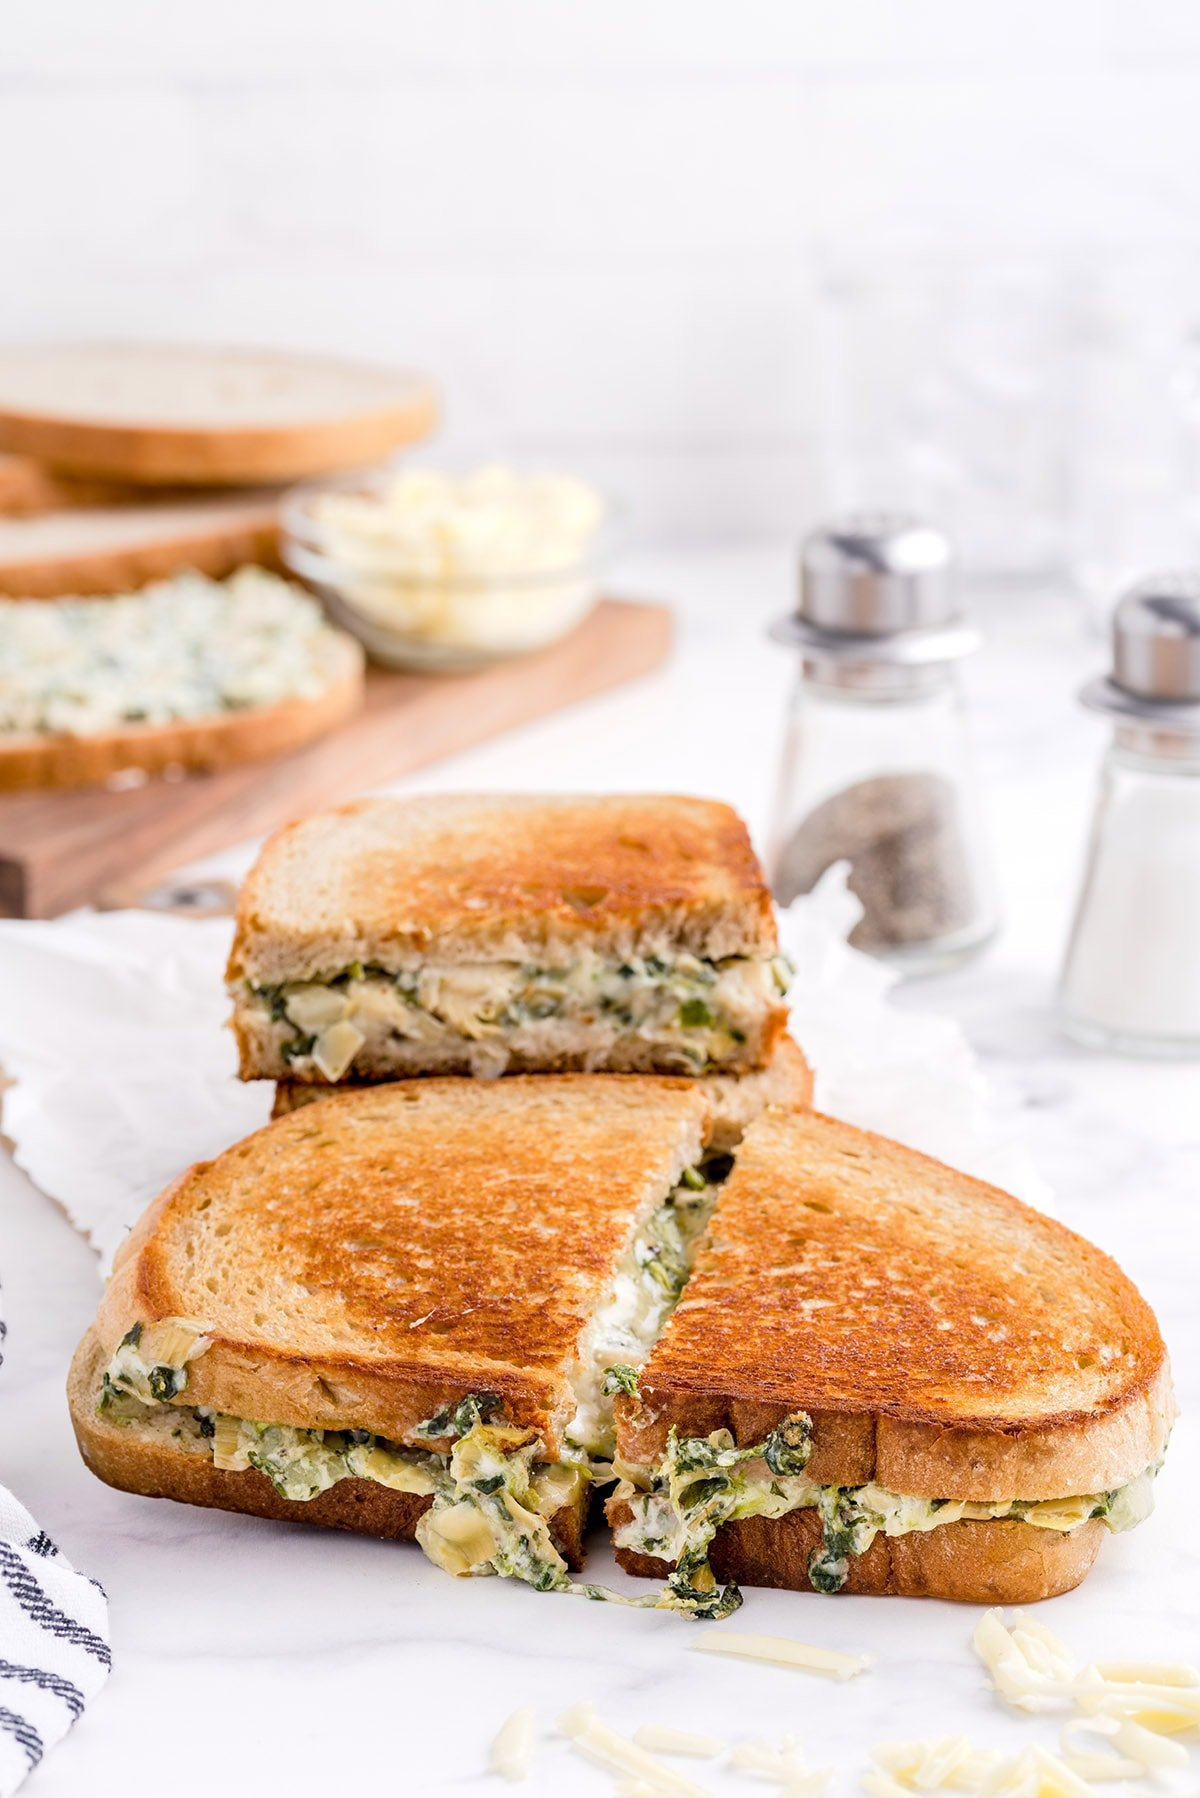 cut the sandwich in half